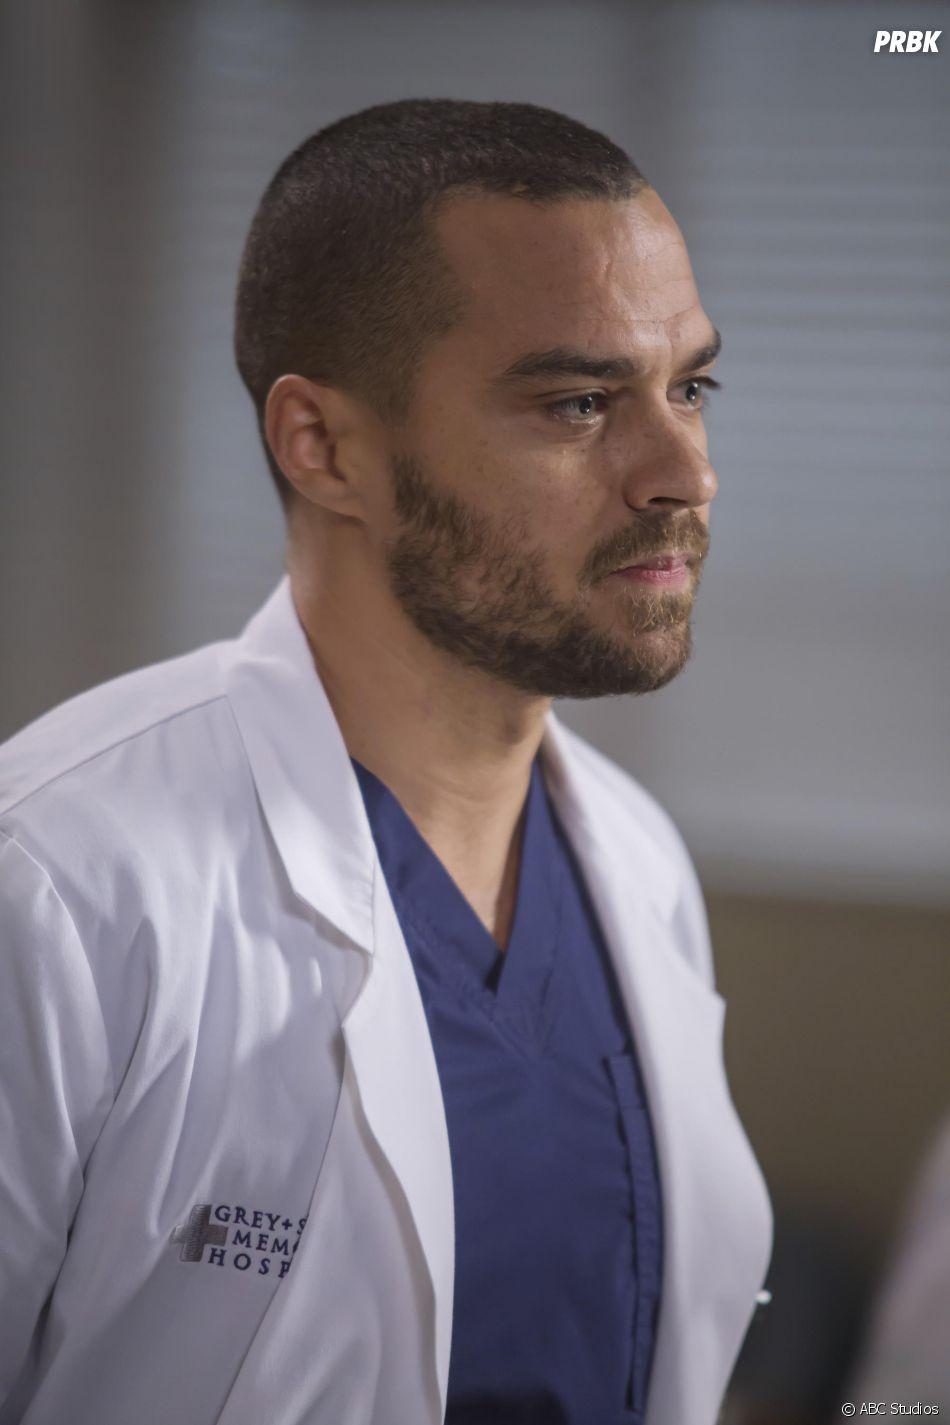 Grey S Anatomy Streaming Images - human body anatomy